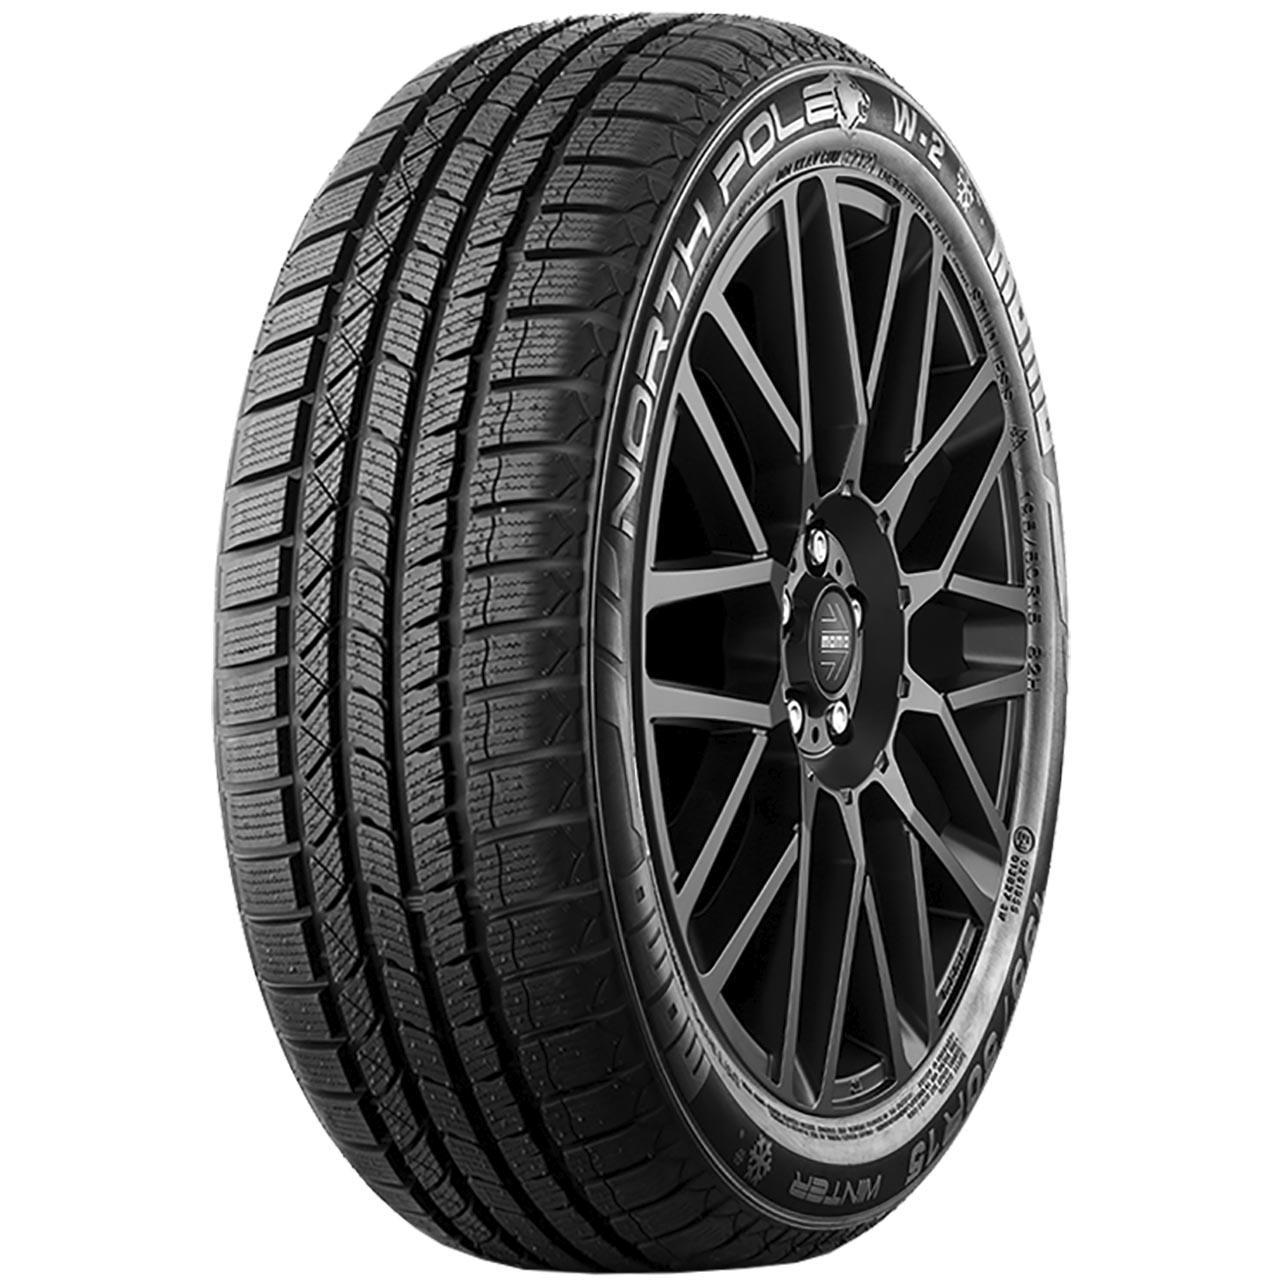 Momo Tire W2 North Pole 205/65R15 94H